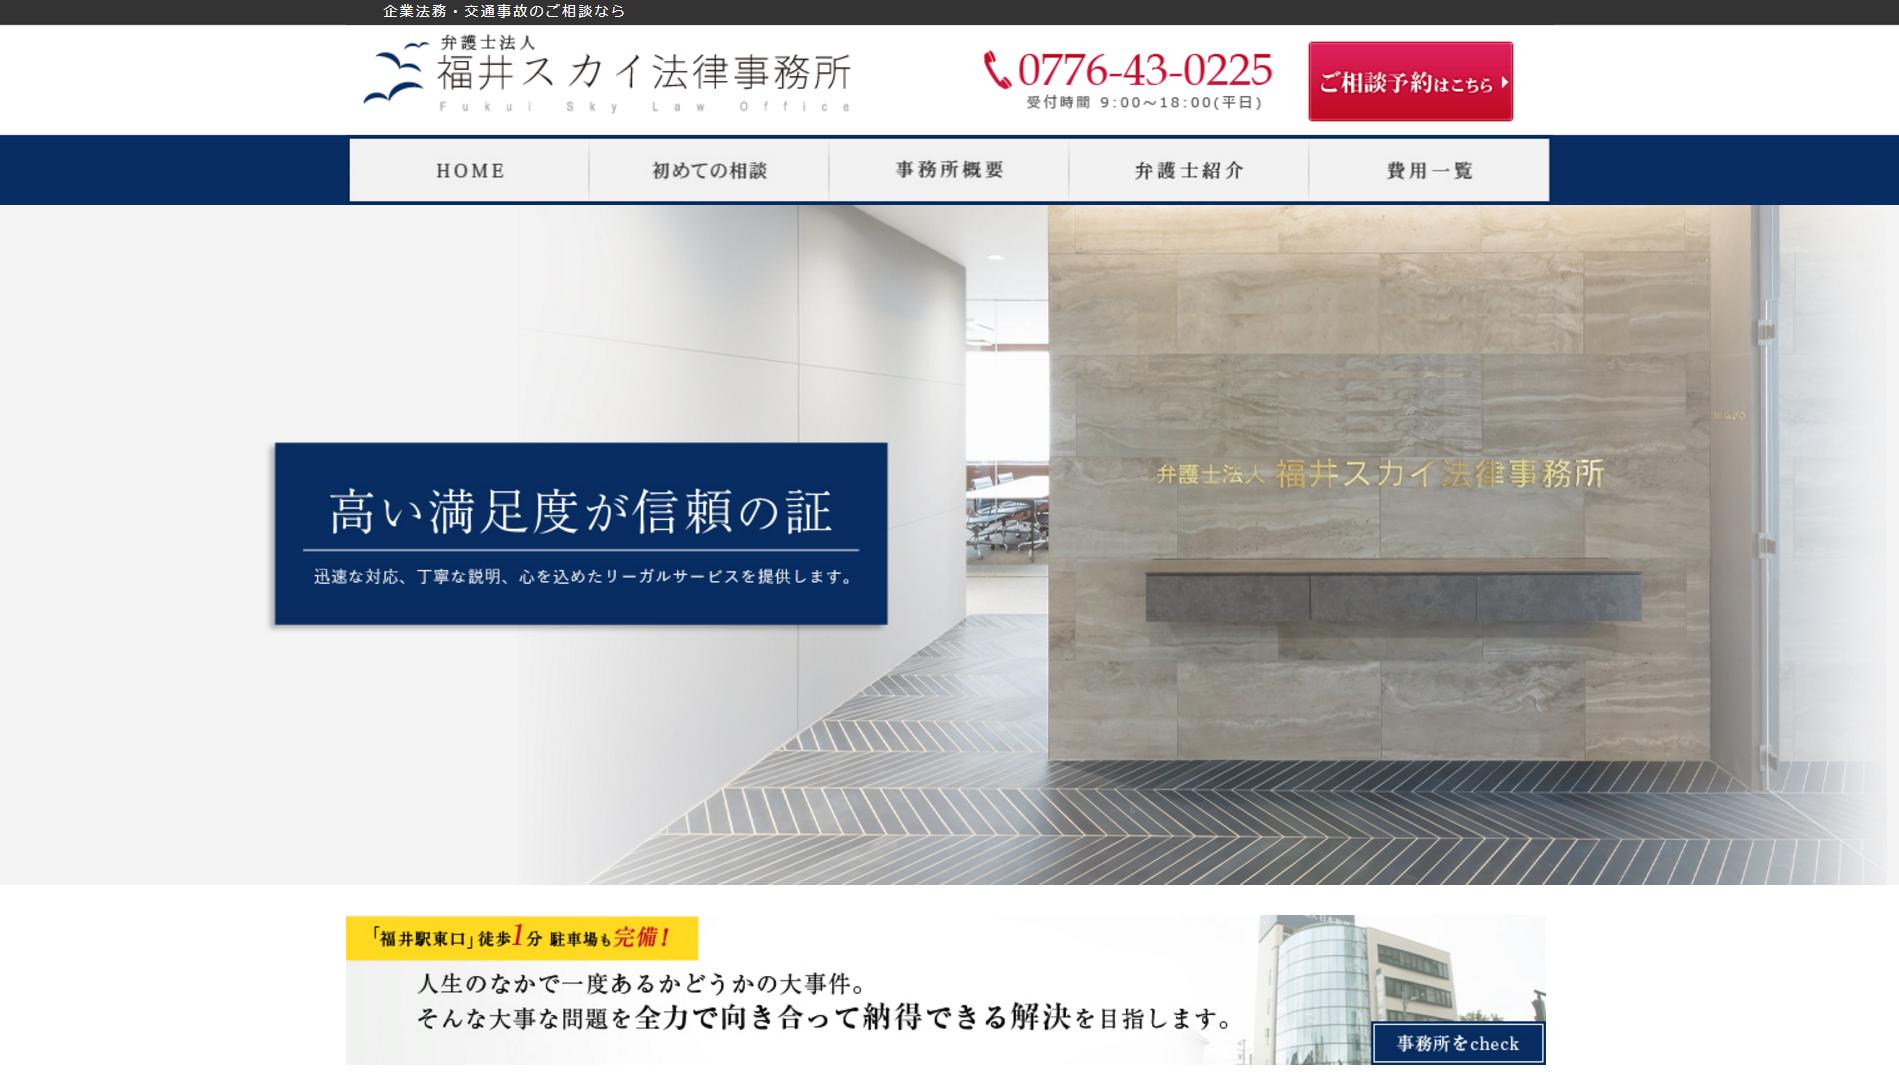 弁護士法人福井スカイ法律事務所